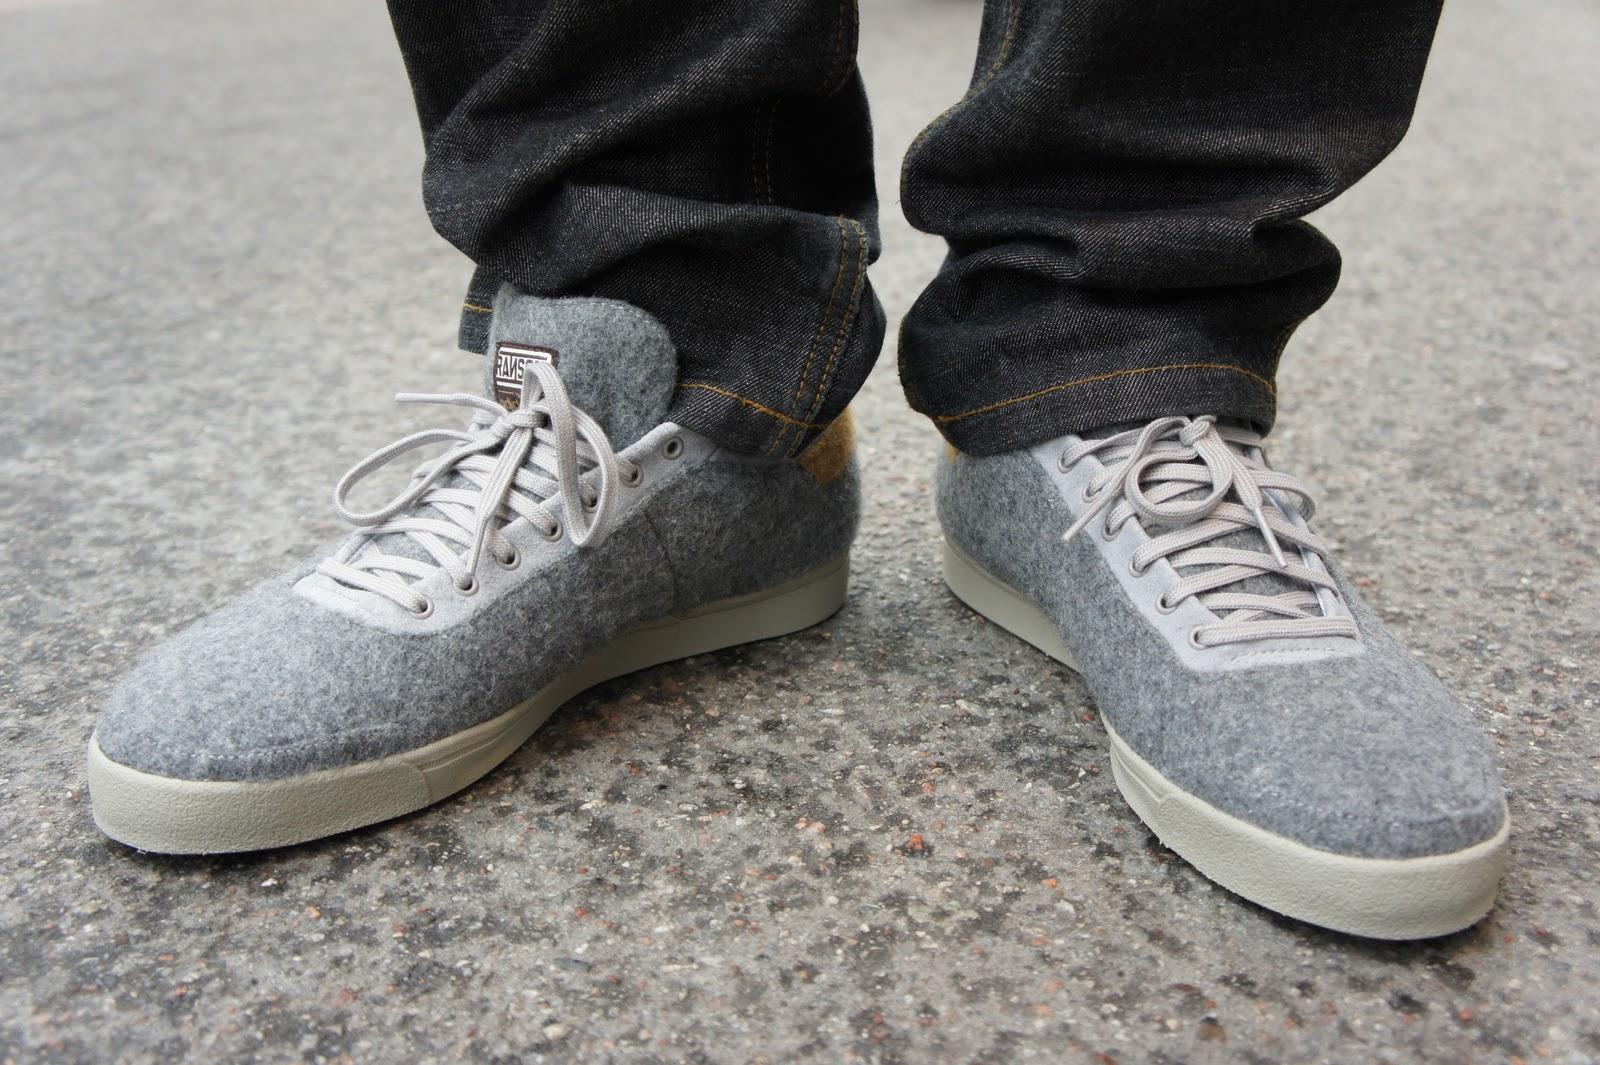 new styles 9bbfa 12ee2 Adidas originals x Strata - 109 €  1099 Sek